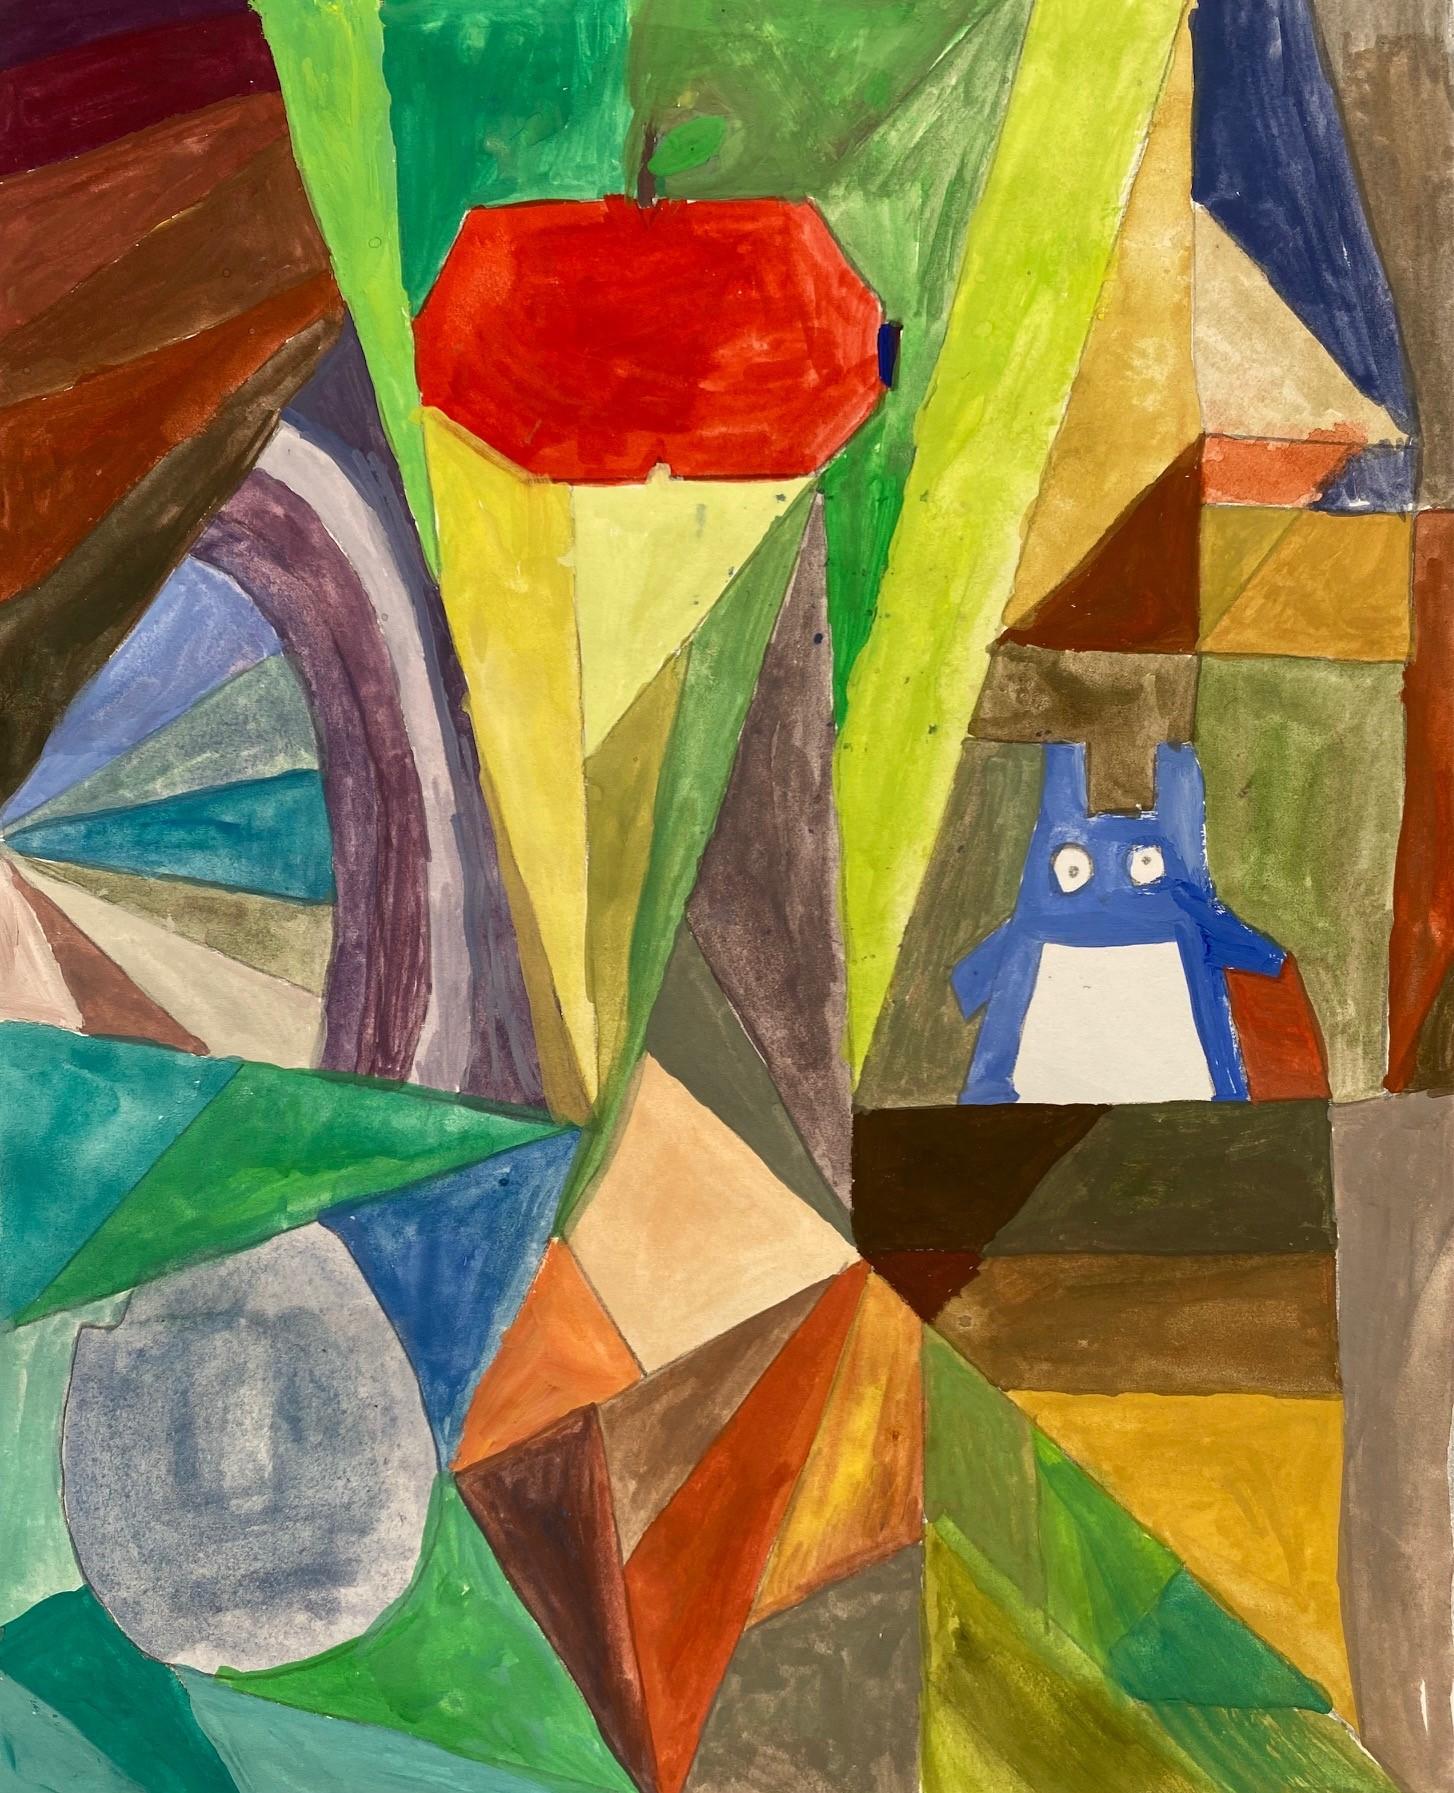 Mavis -artwork inspired by Paul Klee